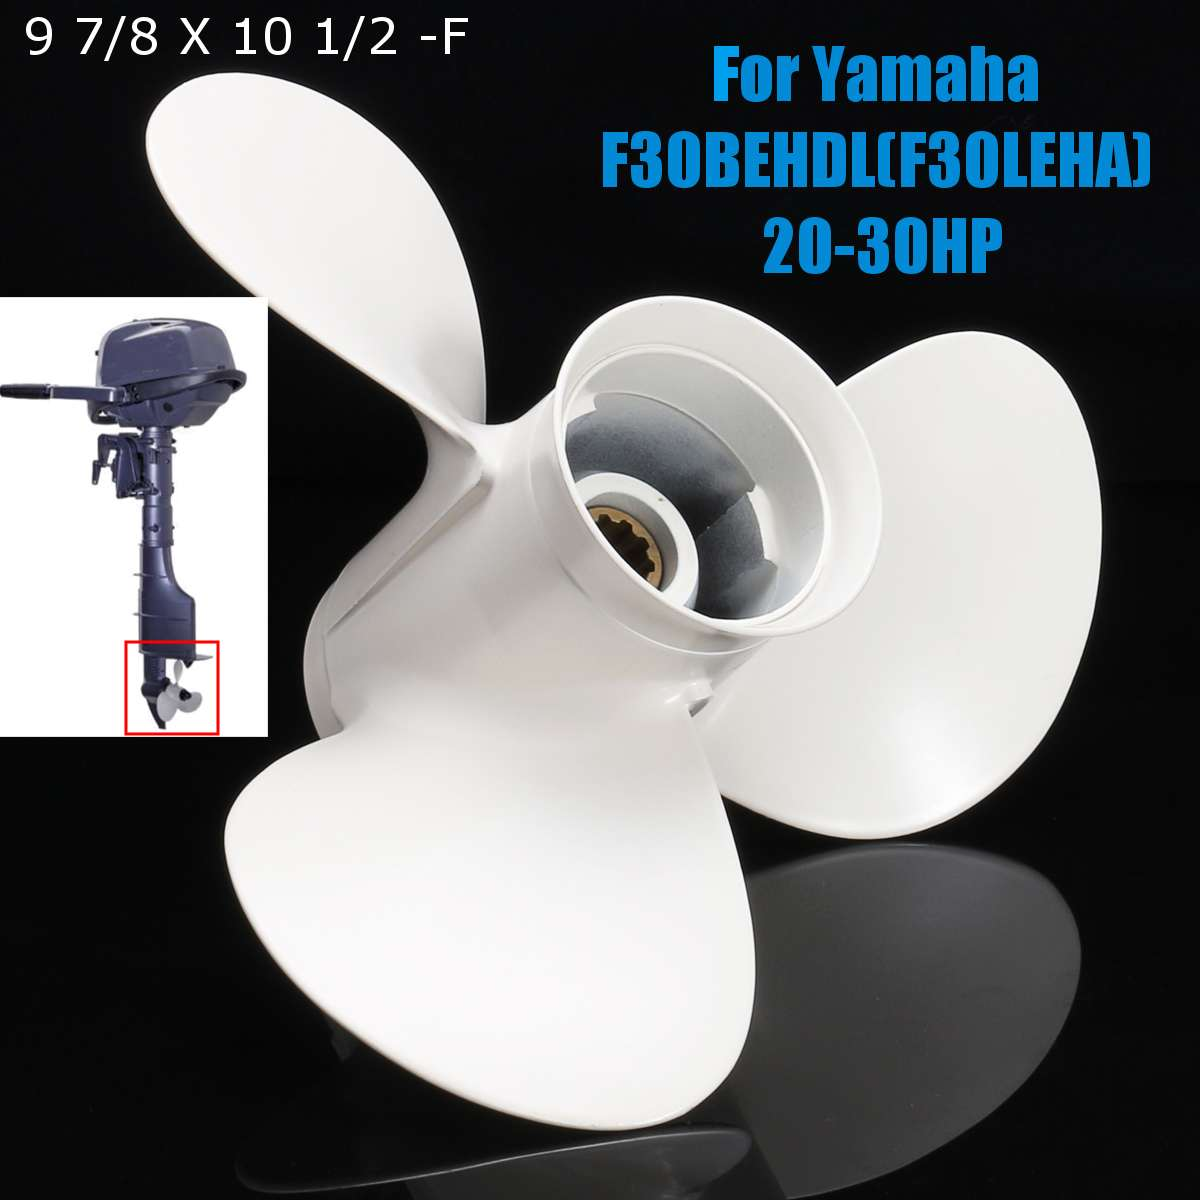 Boat Engine Propeller Aluminum 9 7/8x10 1/2-F for Yamaha 20HP 25HP 30HP Outboard Motors for Yamaha F30BEHDL(F30LEHA) 20-20HPBoat Engine Propeller Aluminum 9 7/8x10 1/2-F for Yamaha 20HP 25HP 30HP Outboard Motors for Yamaha F30BEHDL(F30LEHA) 20-20HP